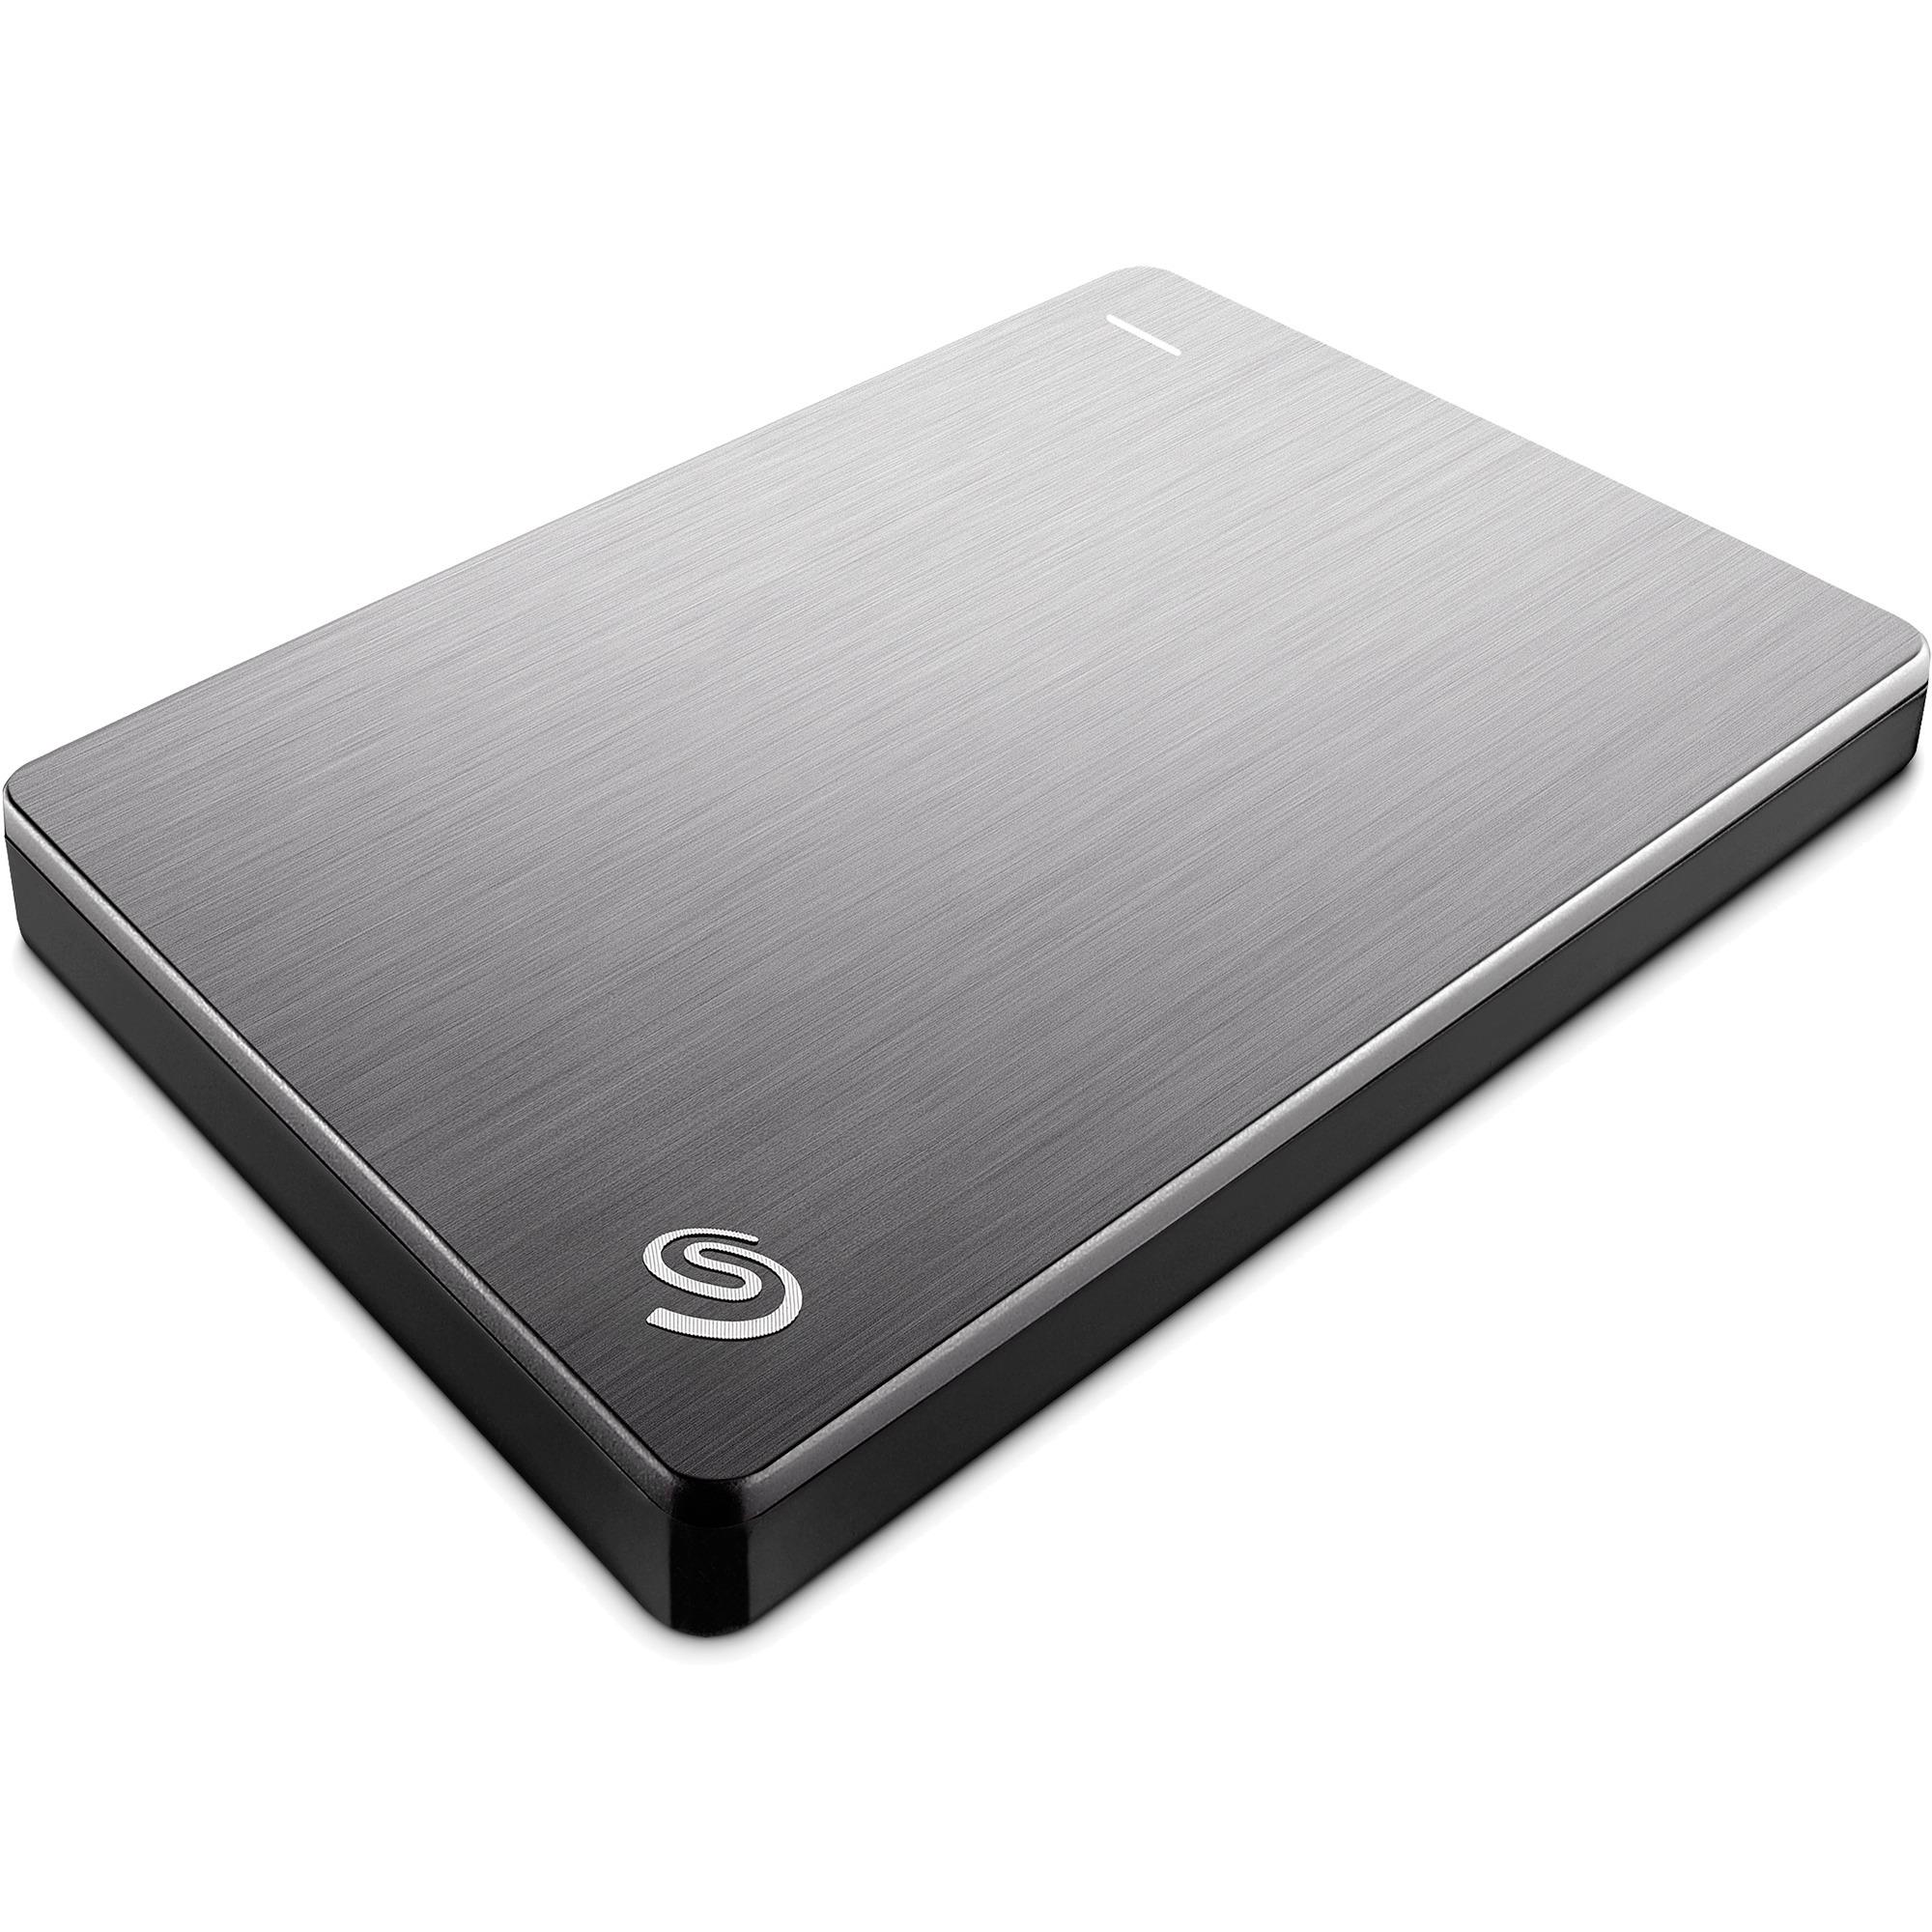 Backup Plus Slim Portable 2TB disco duro externo 2000 GB Plata, Unidad de disco duro